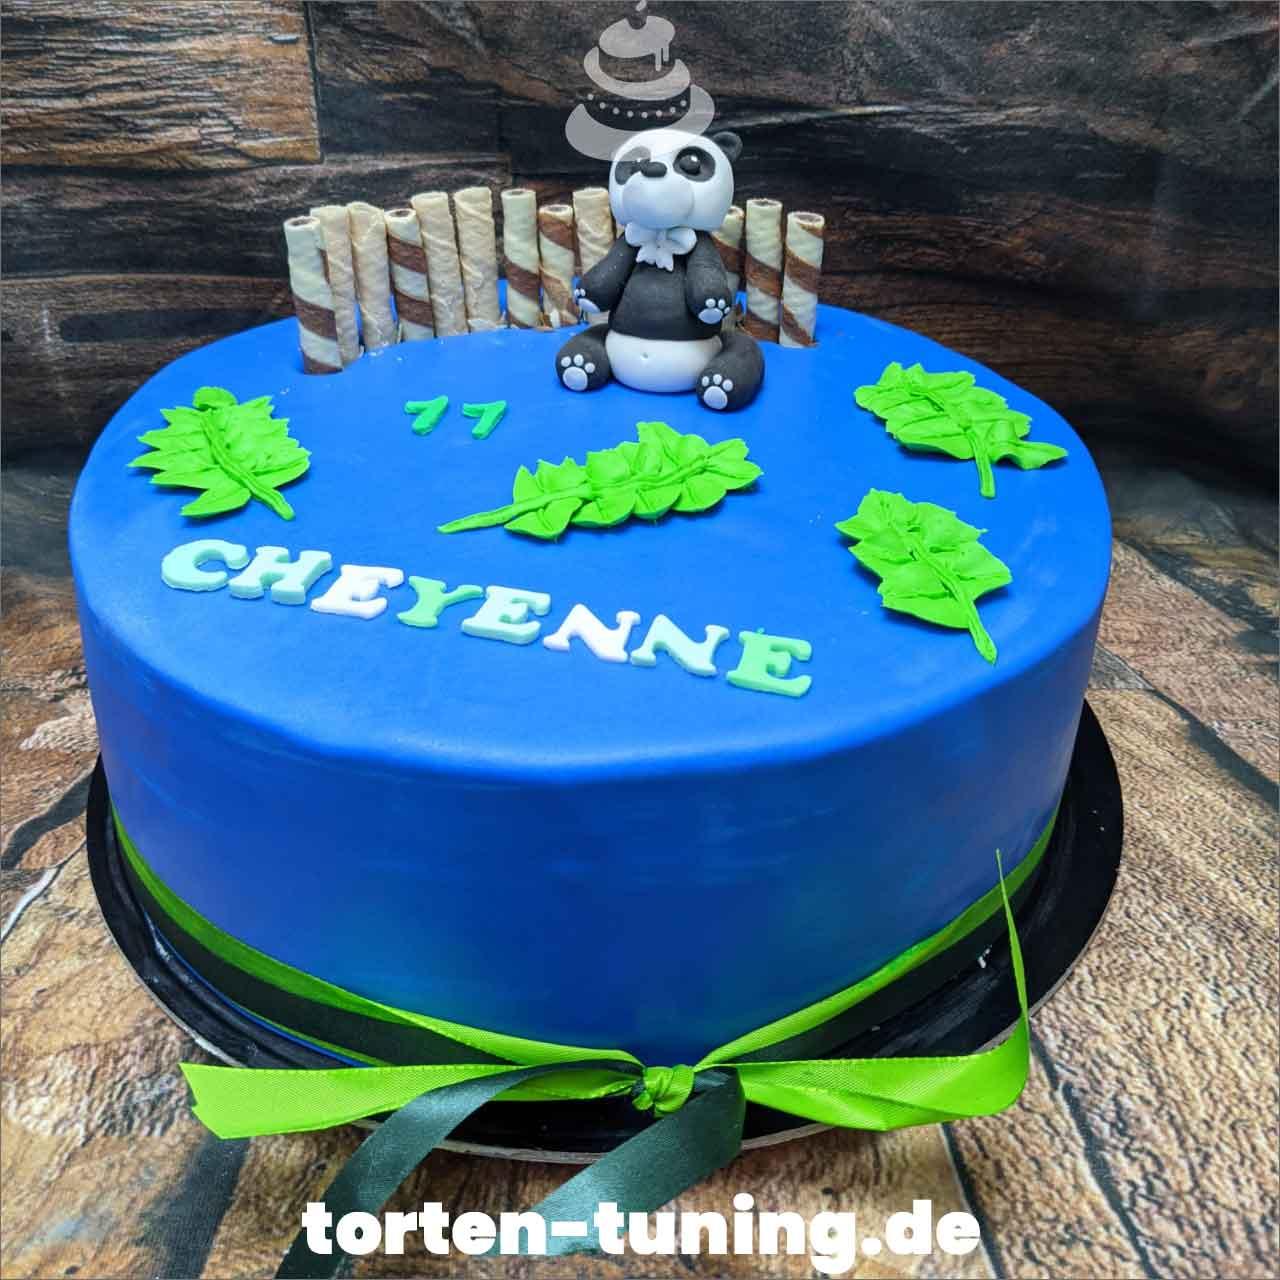 Panda Dripcake Obsttorte Geburtstagstorte Motivtorte Torte Tortendekoration Torte online bestellen Suhl Thüringen Torten Tuning Sahnetorte Tortenfiguren Cake Topper